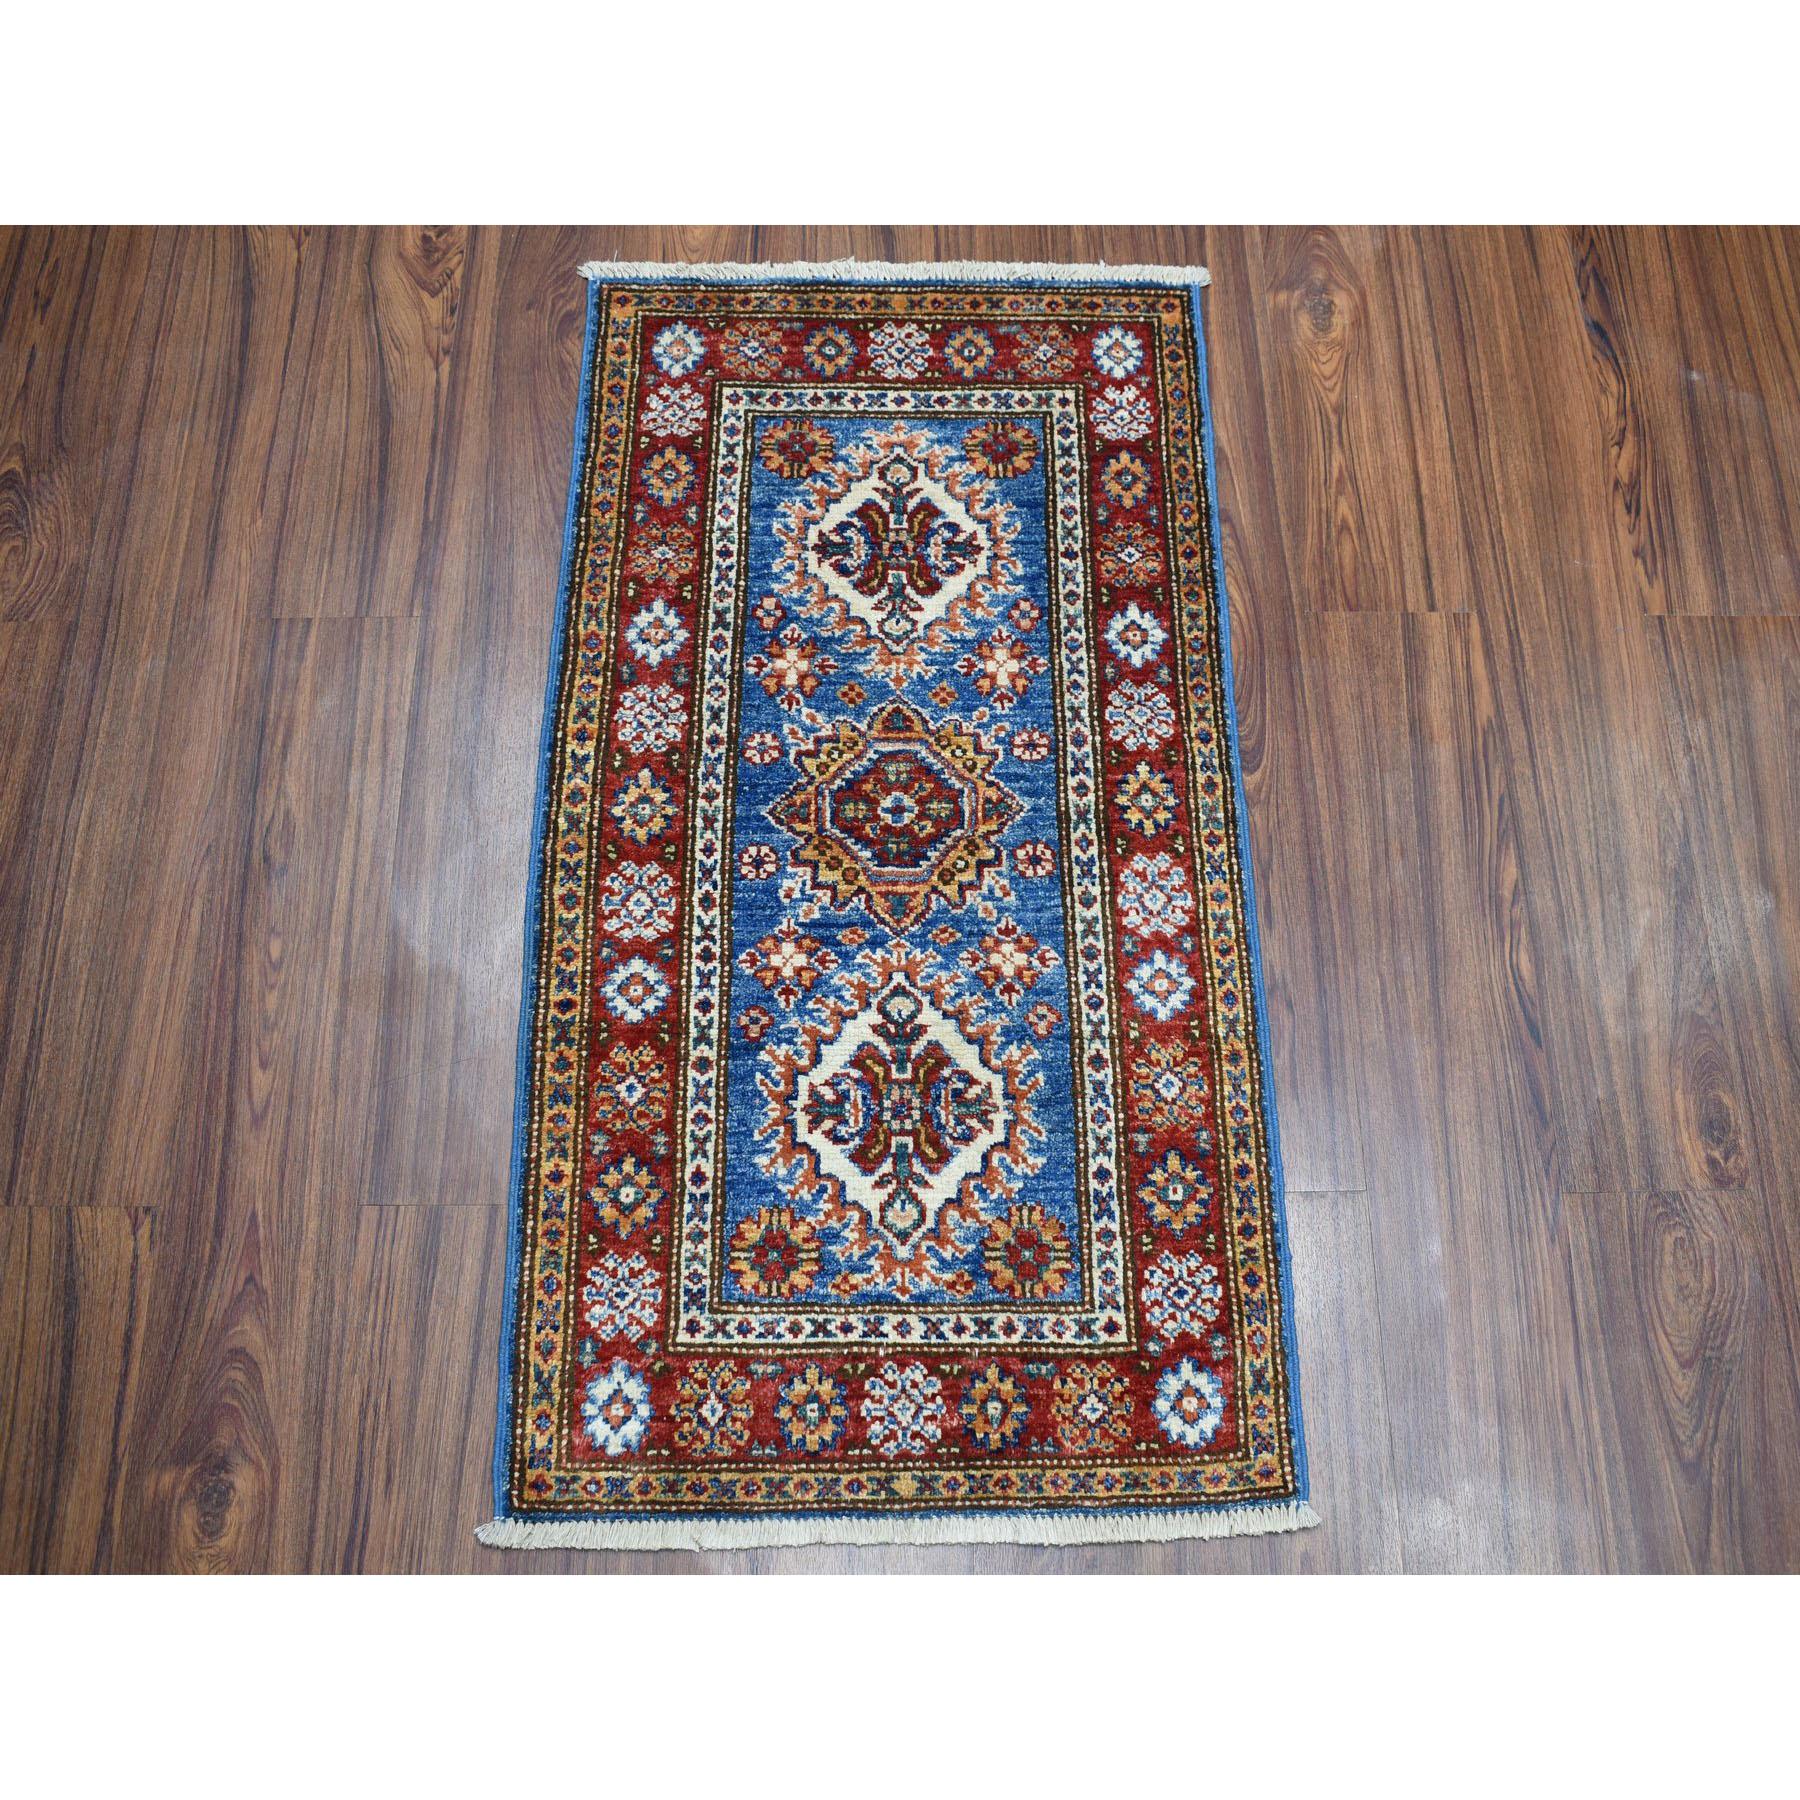 1-10 x3-2  Blue Super Kazak Pure Wool Geometric Design Hand-Knotted Oriental Rug